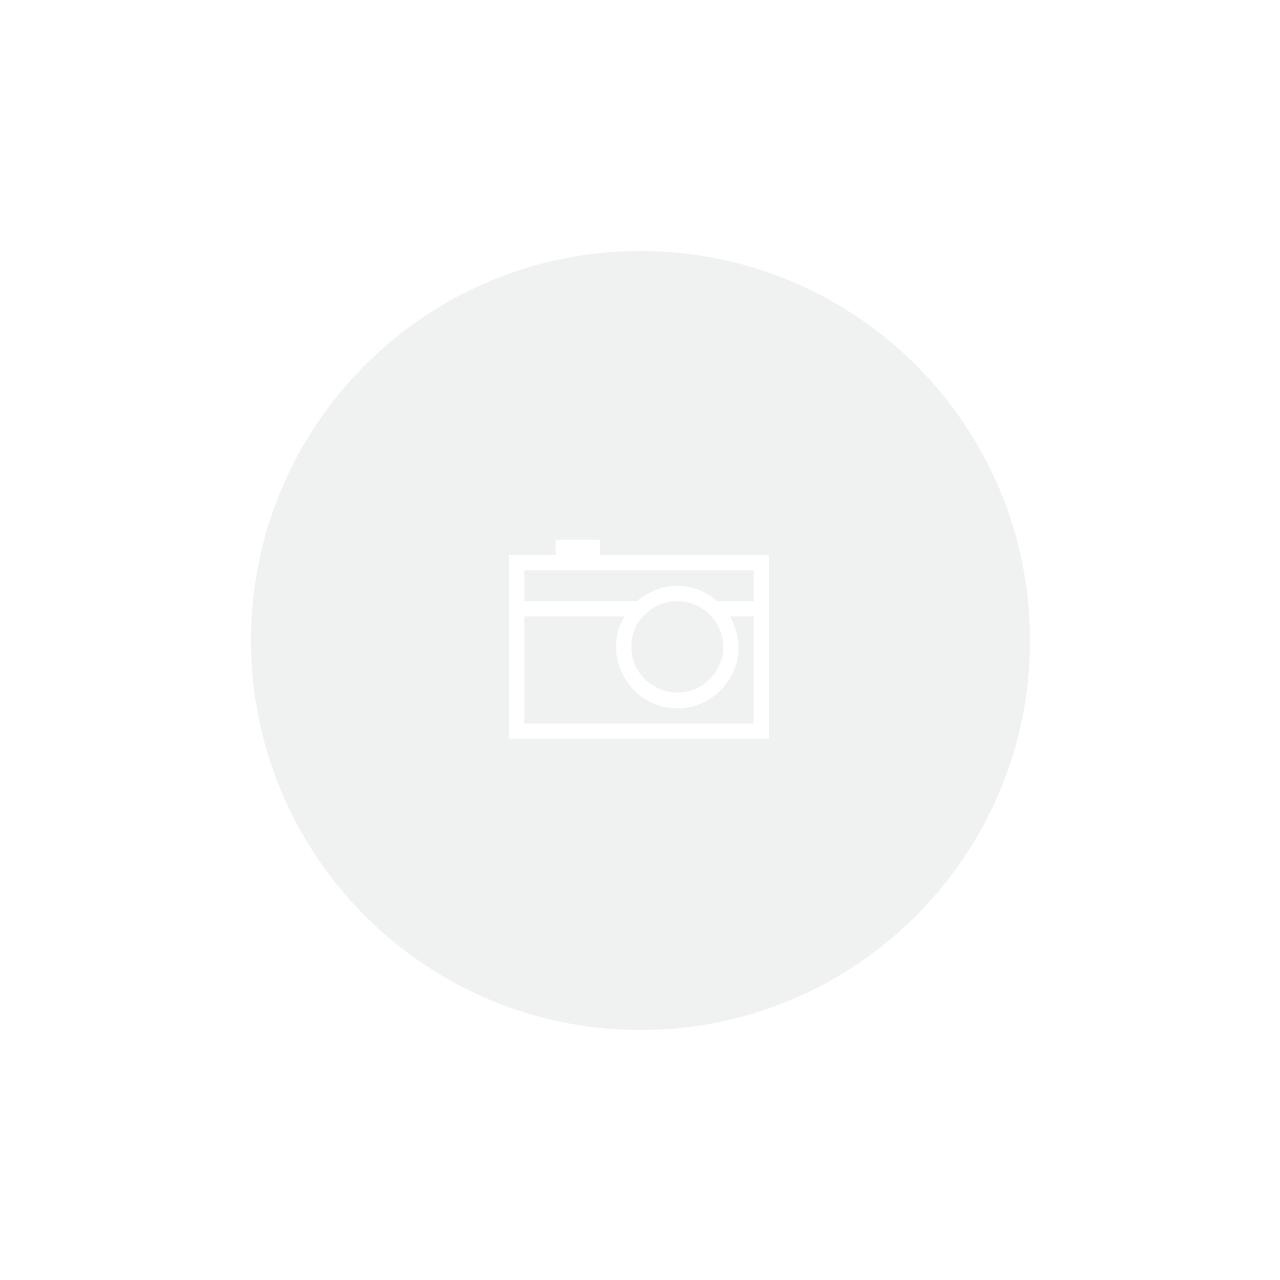 Placa de Vídeo EVGA GTX 1070 SC GAMING ACX 3.0  8GB GDDR5 08G-P4-6173-KR